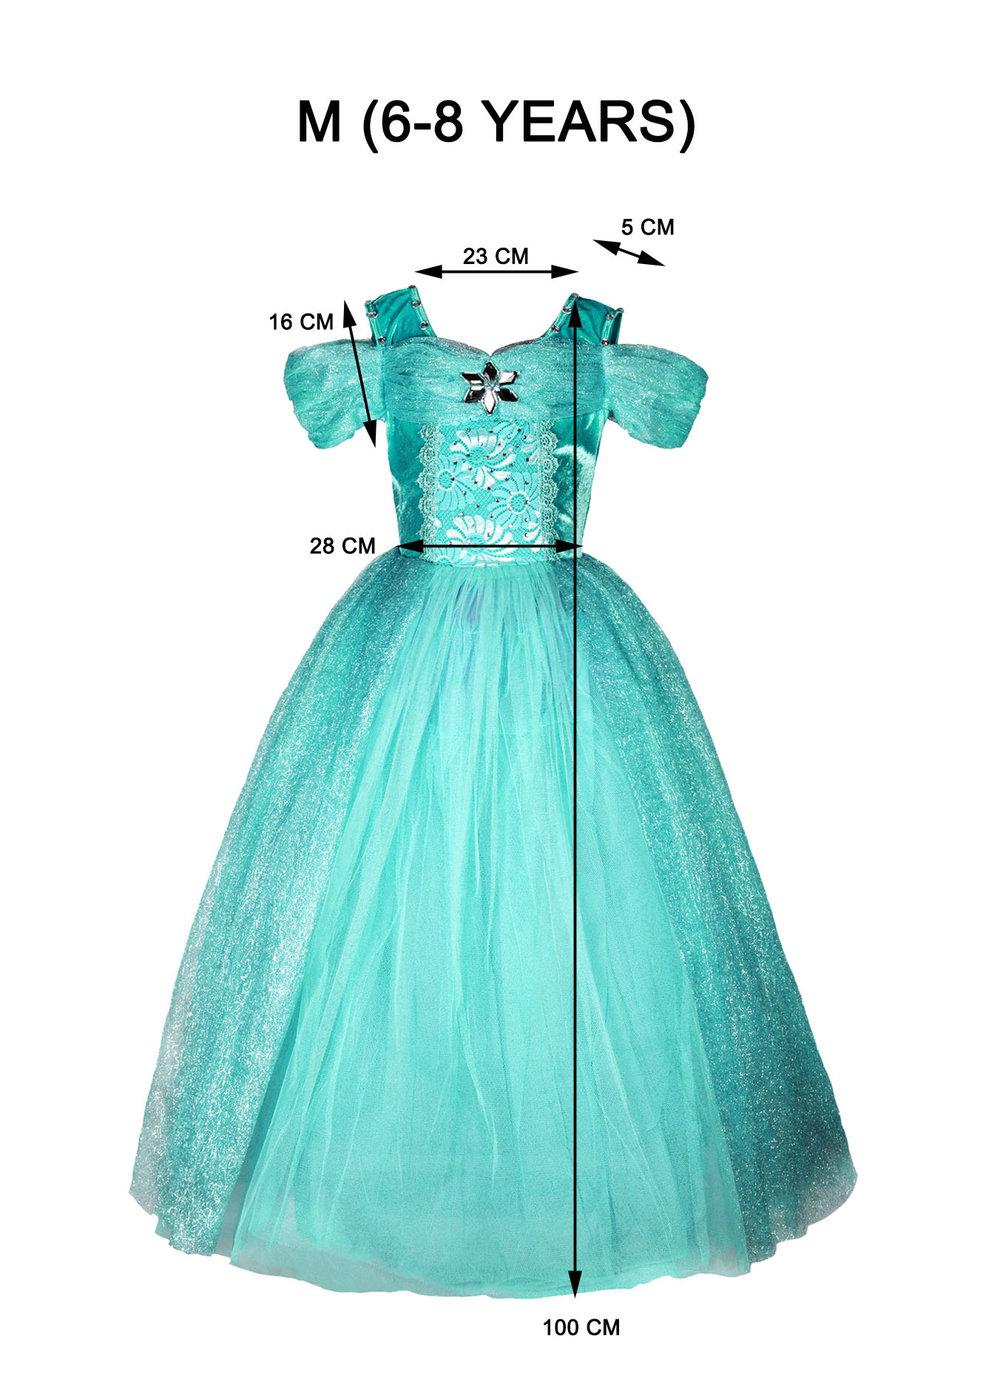 Sparkly Princess Turquoise M.jpg